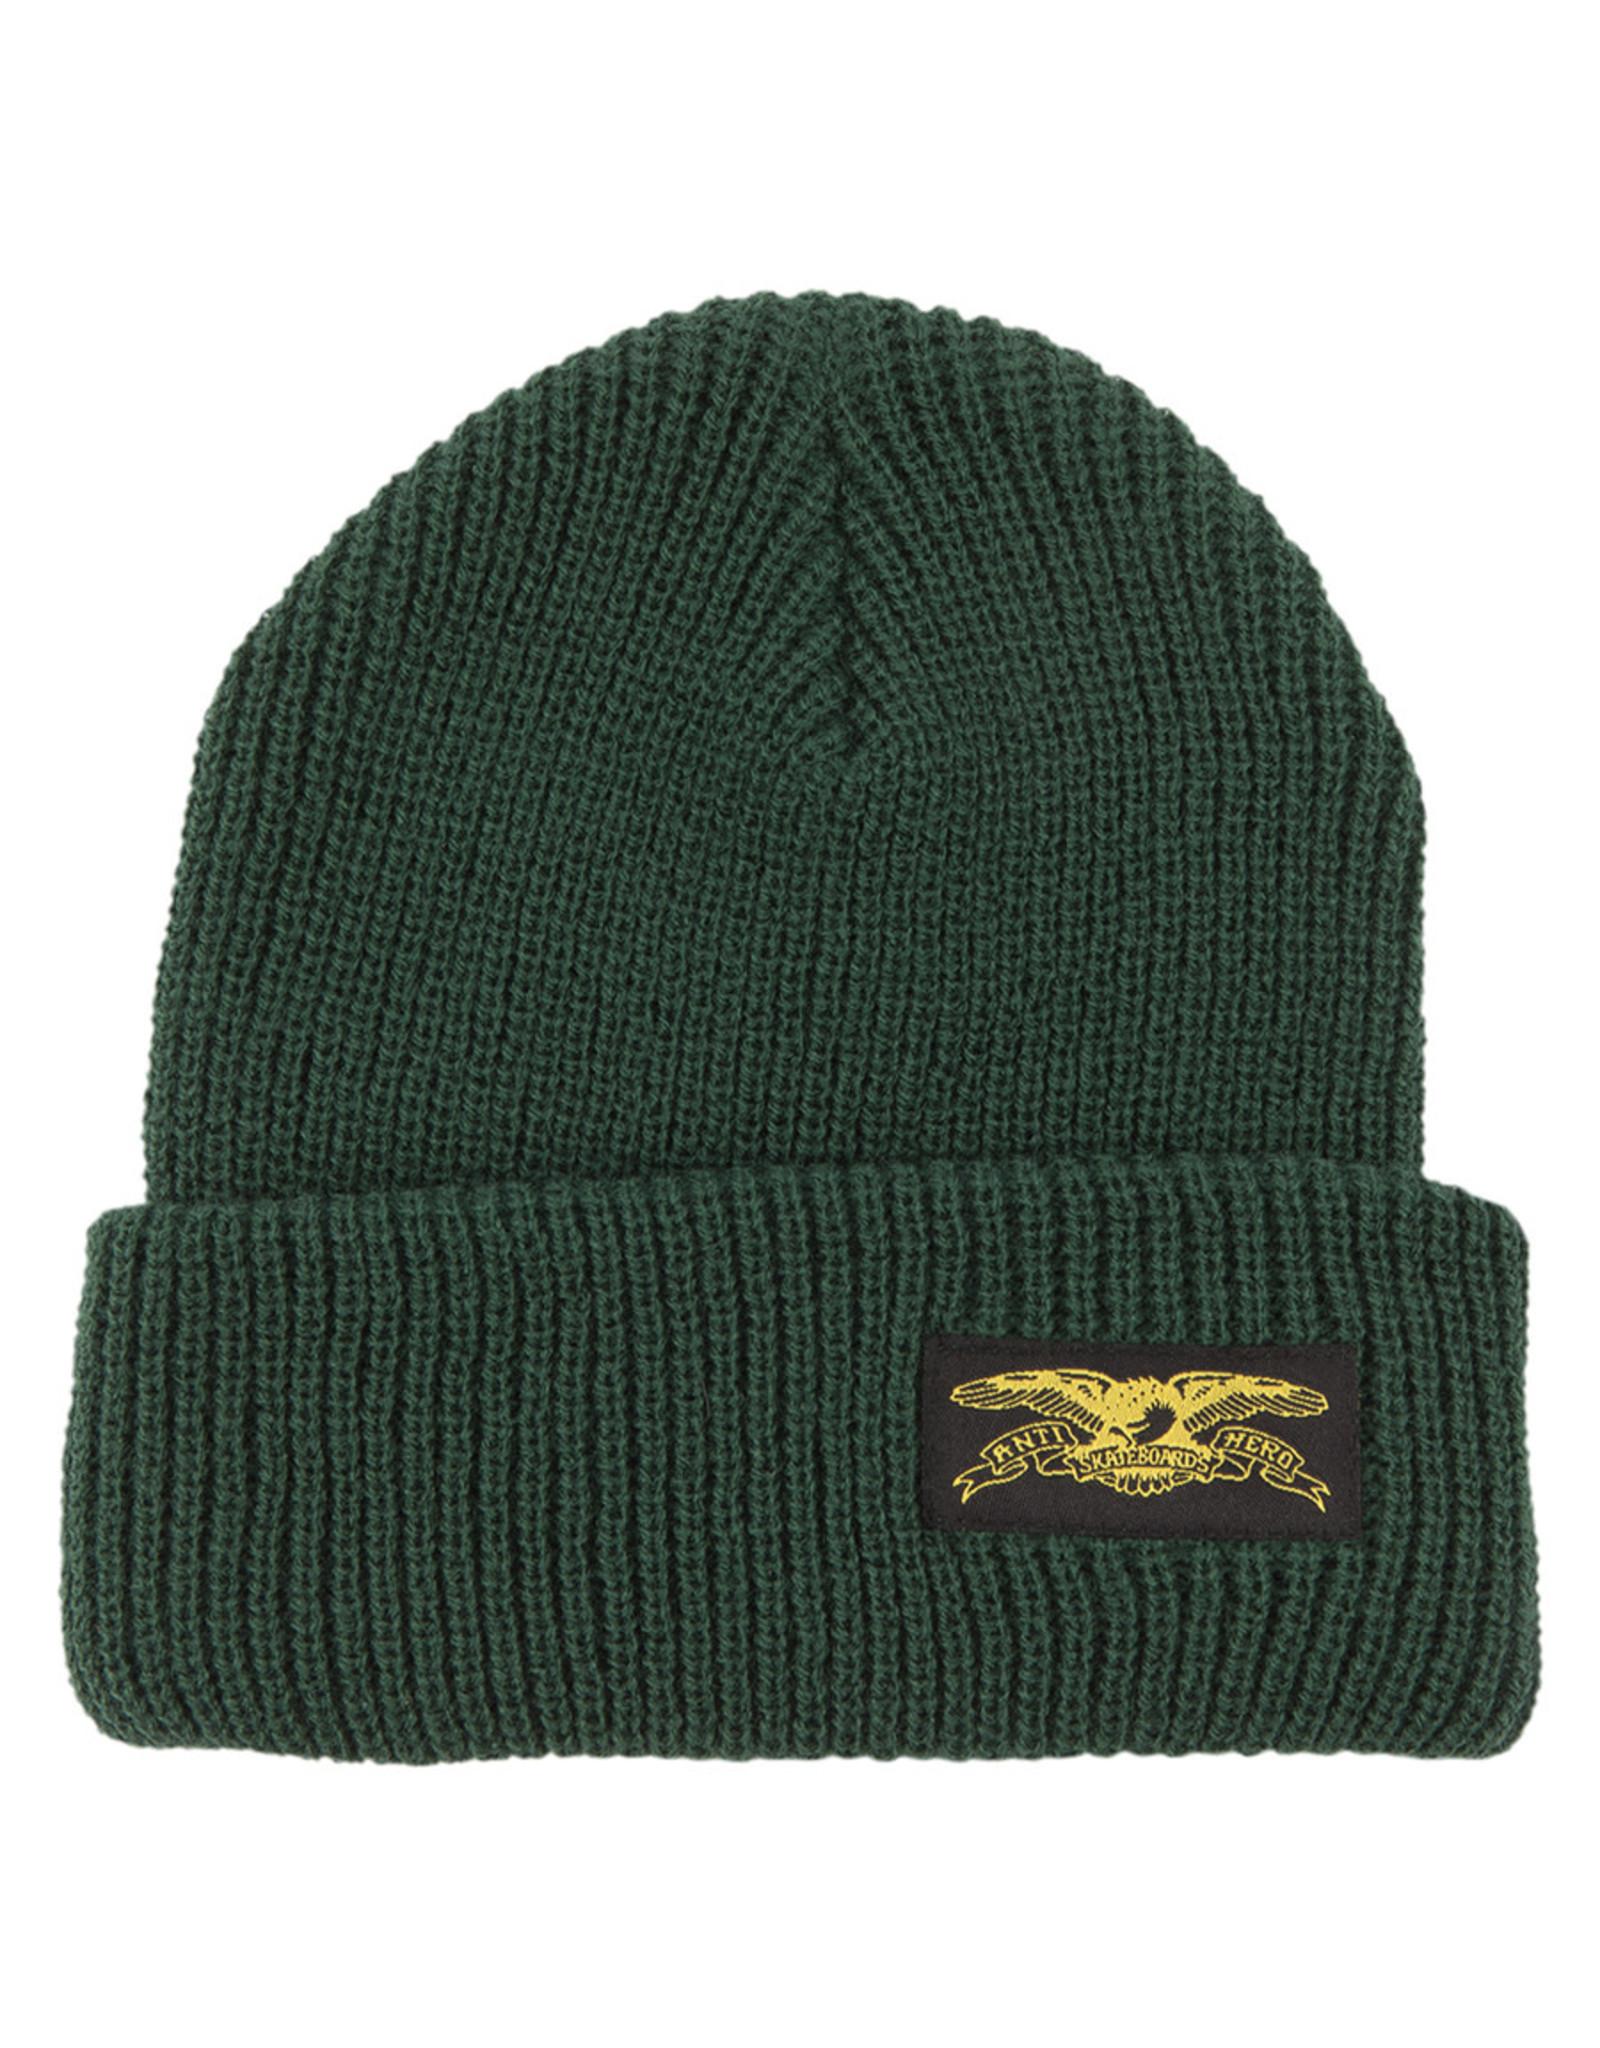 Anti Hero Anti Hero Beanie Stock Eagle Label Cuff (Dark Green)